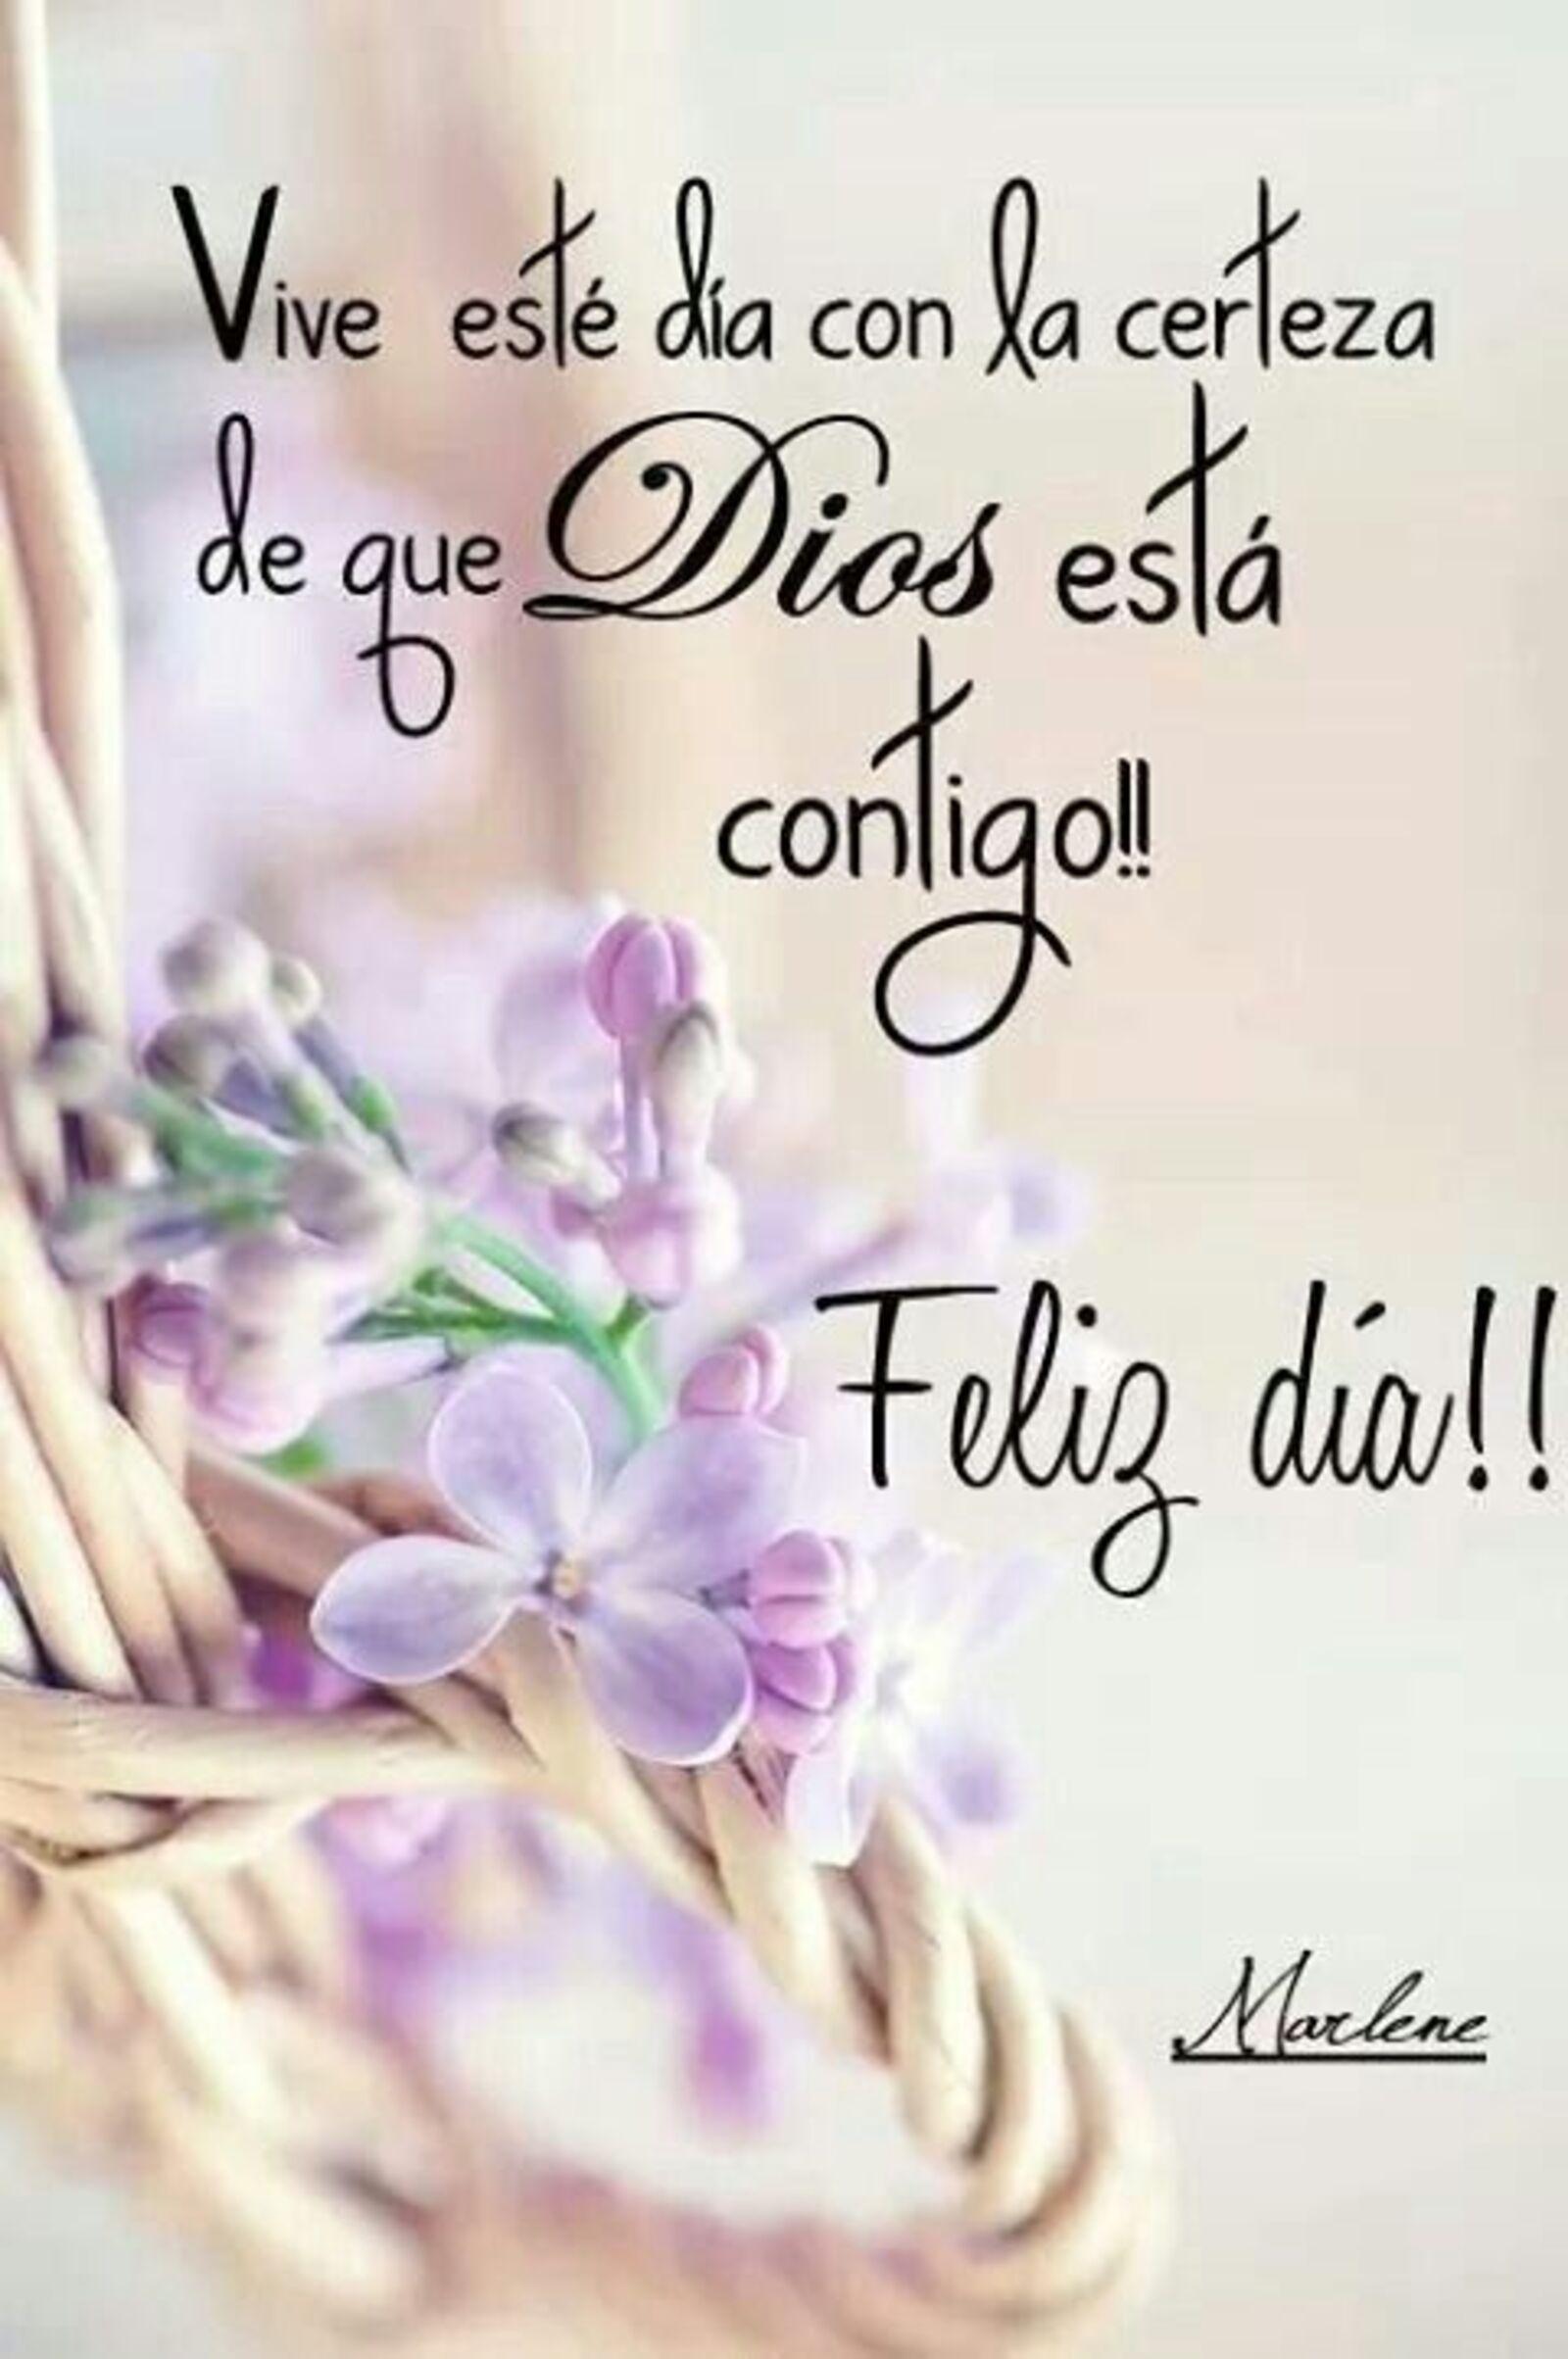 Vive esté día con la certeza de que Dios esta contigo!! Feliz día!!